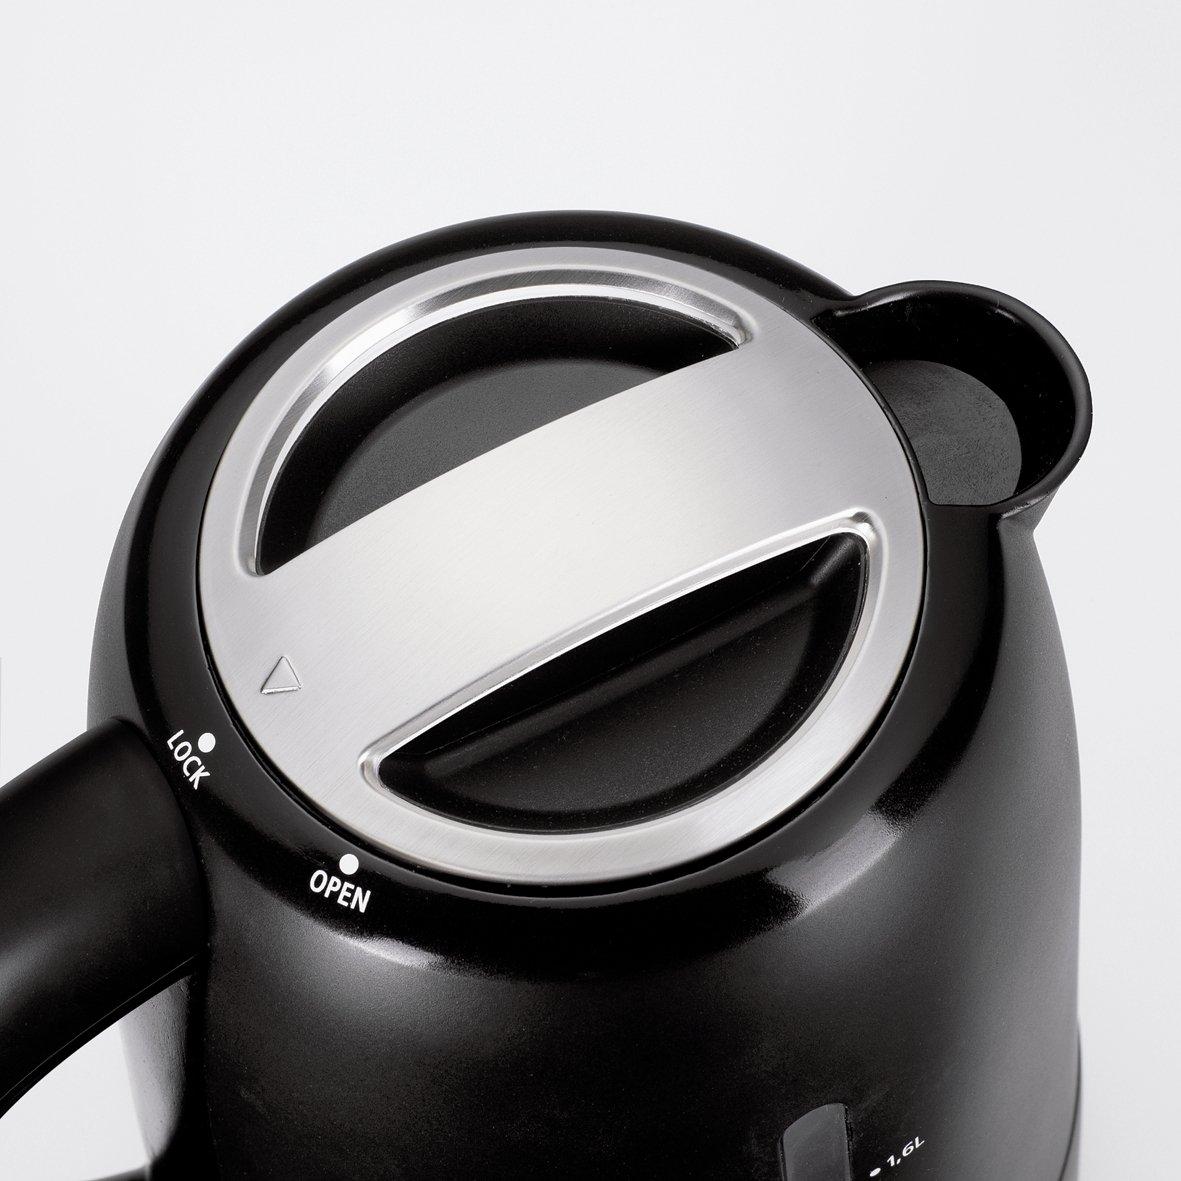 Krups FLF2, Negro, Acero inoxidable - Calentador de agua: Amazon.es: Hogar